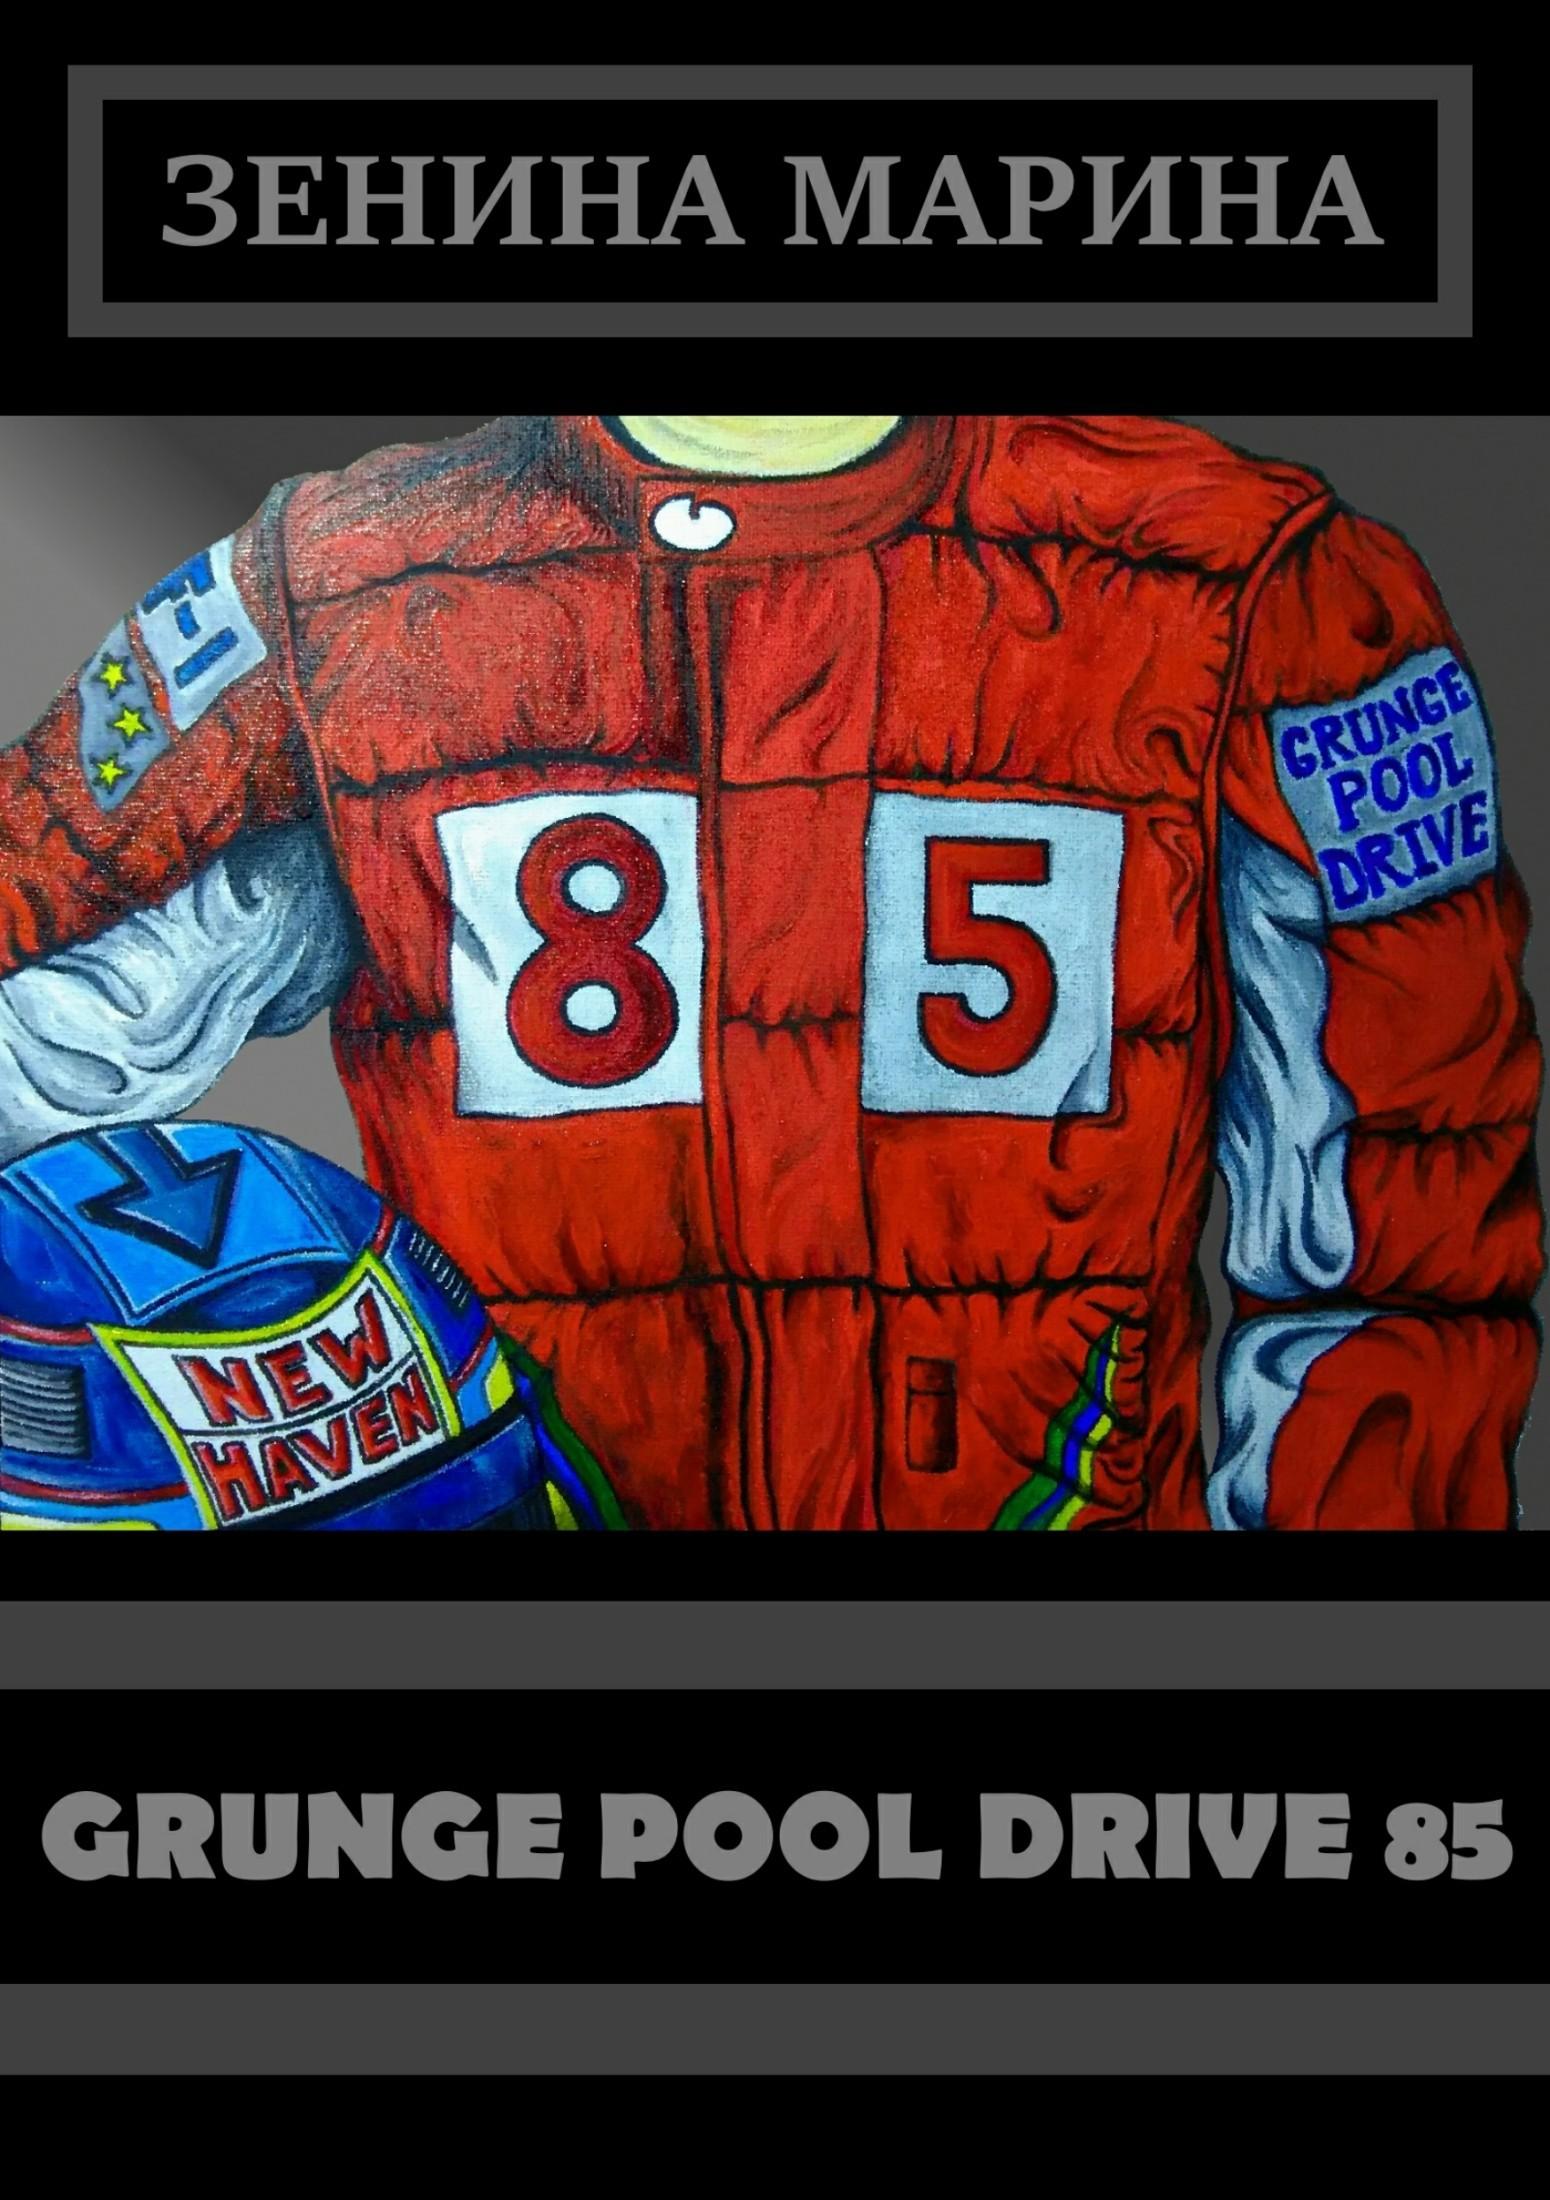 Grunge Pool Drive 85